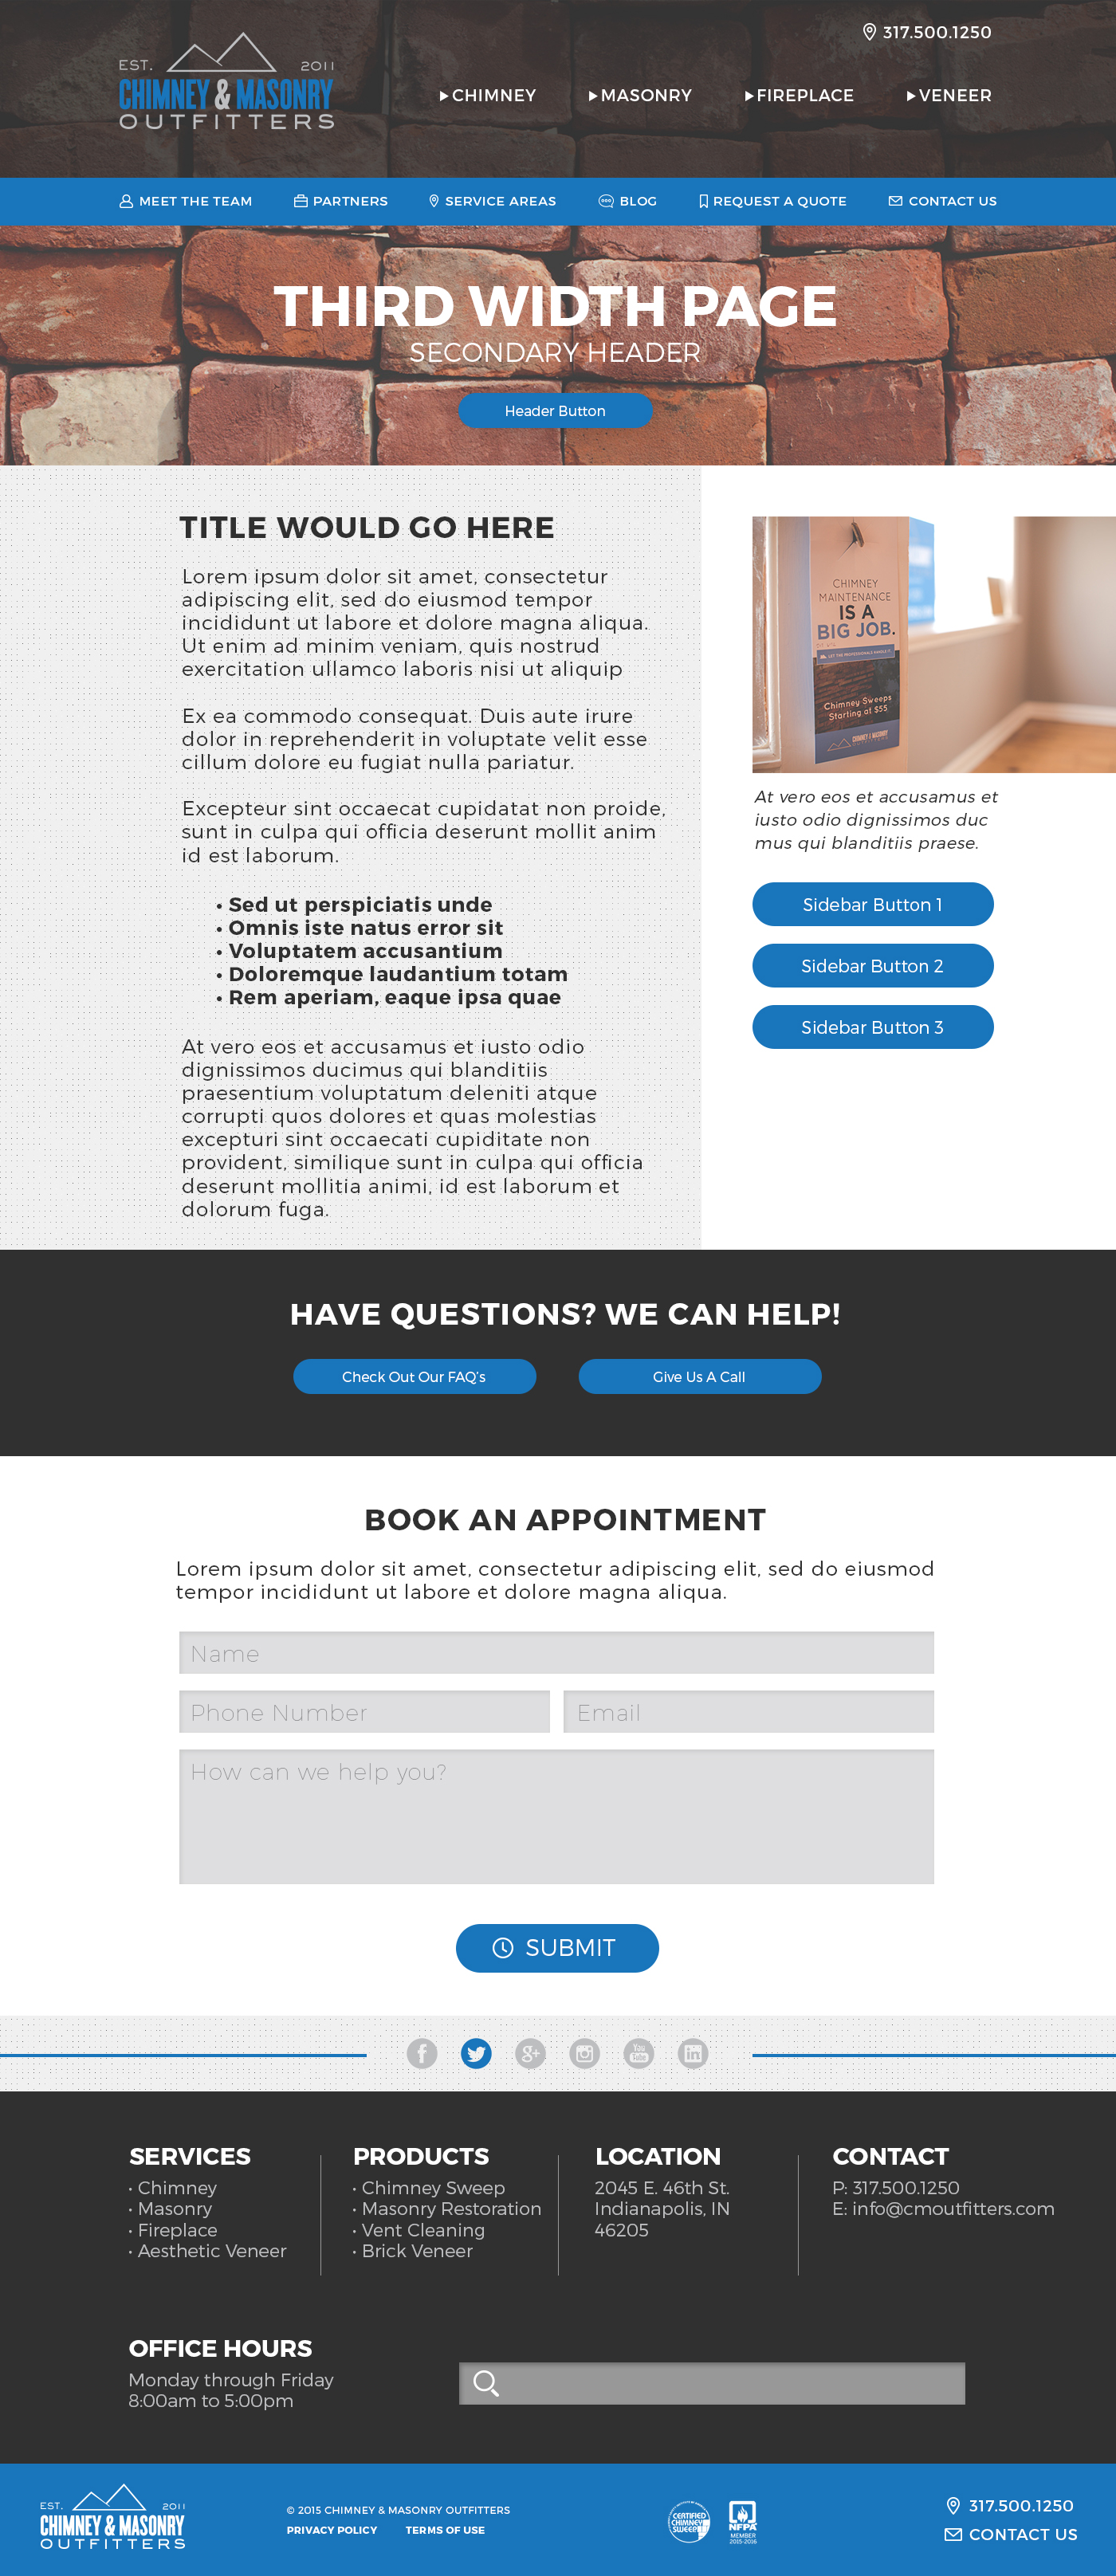 CMO-WebsiteDesign-SecondaryPage-ThirdWidth.jpg